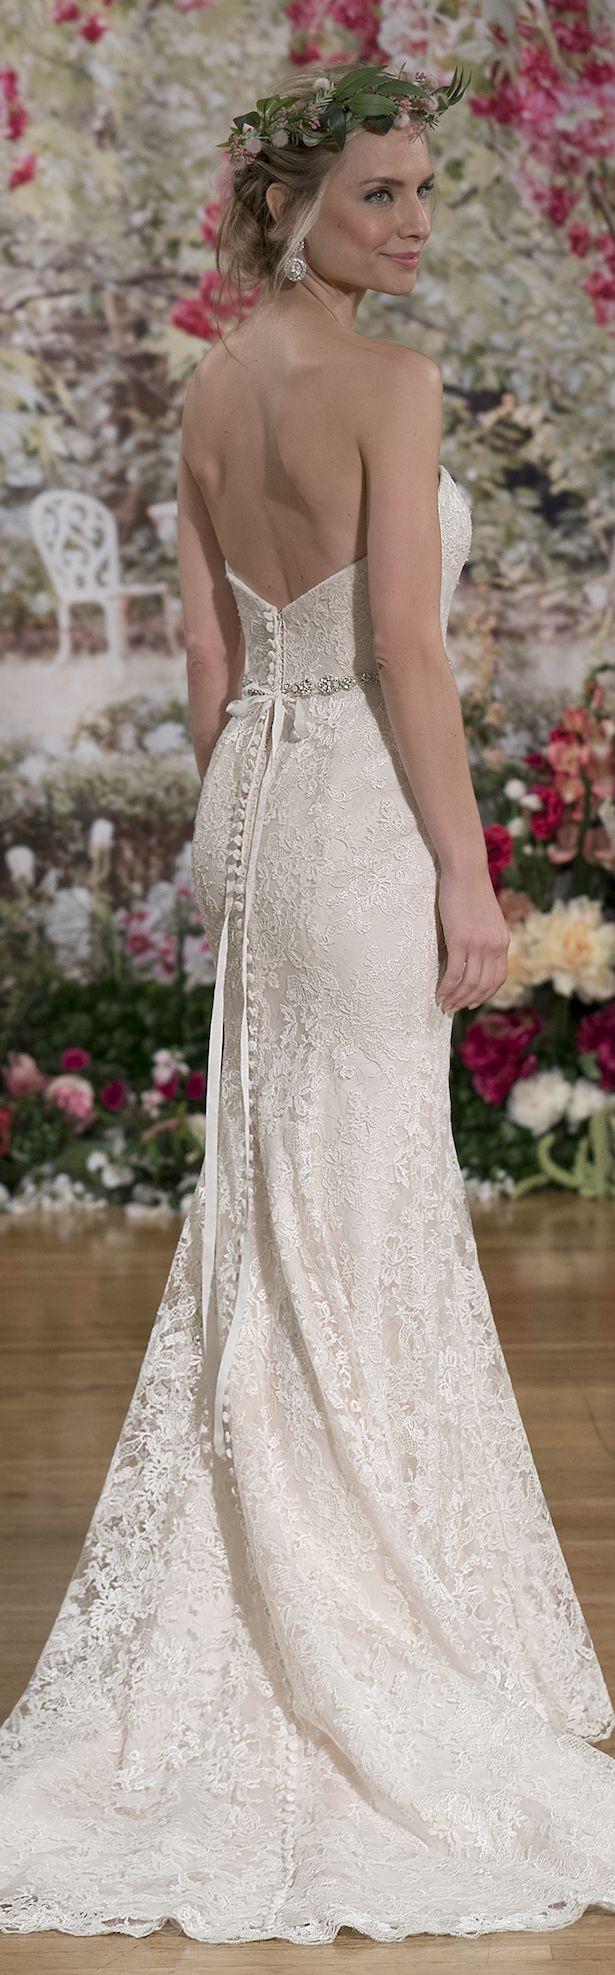 Maggie Sottero Wedding Dresses Fall 2017   NYBFW Runway Show